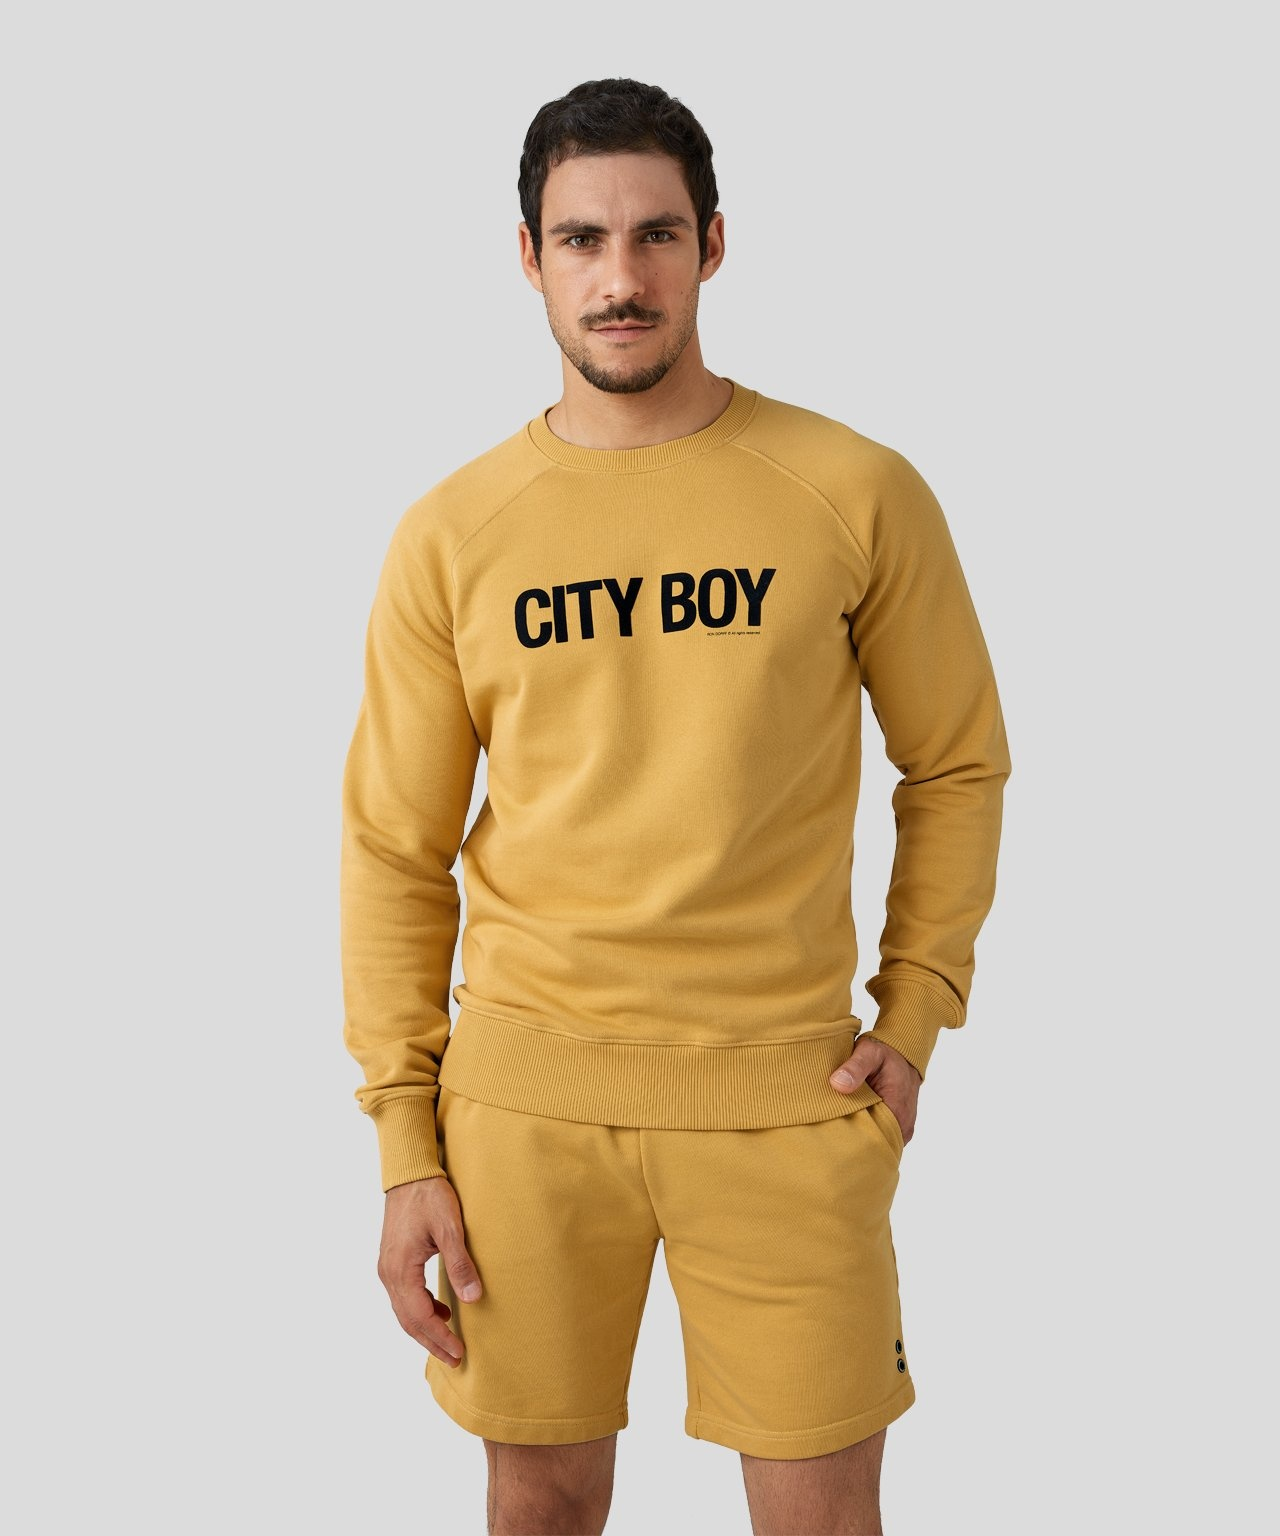 Ron Dorff CITY BOY sweatshirt